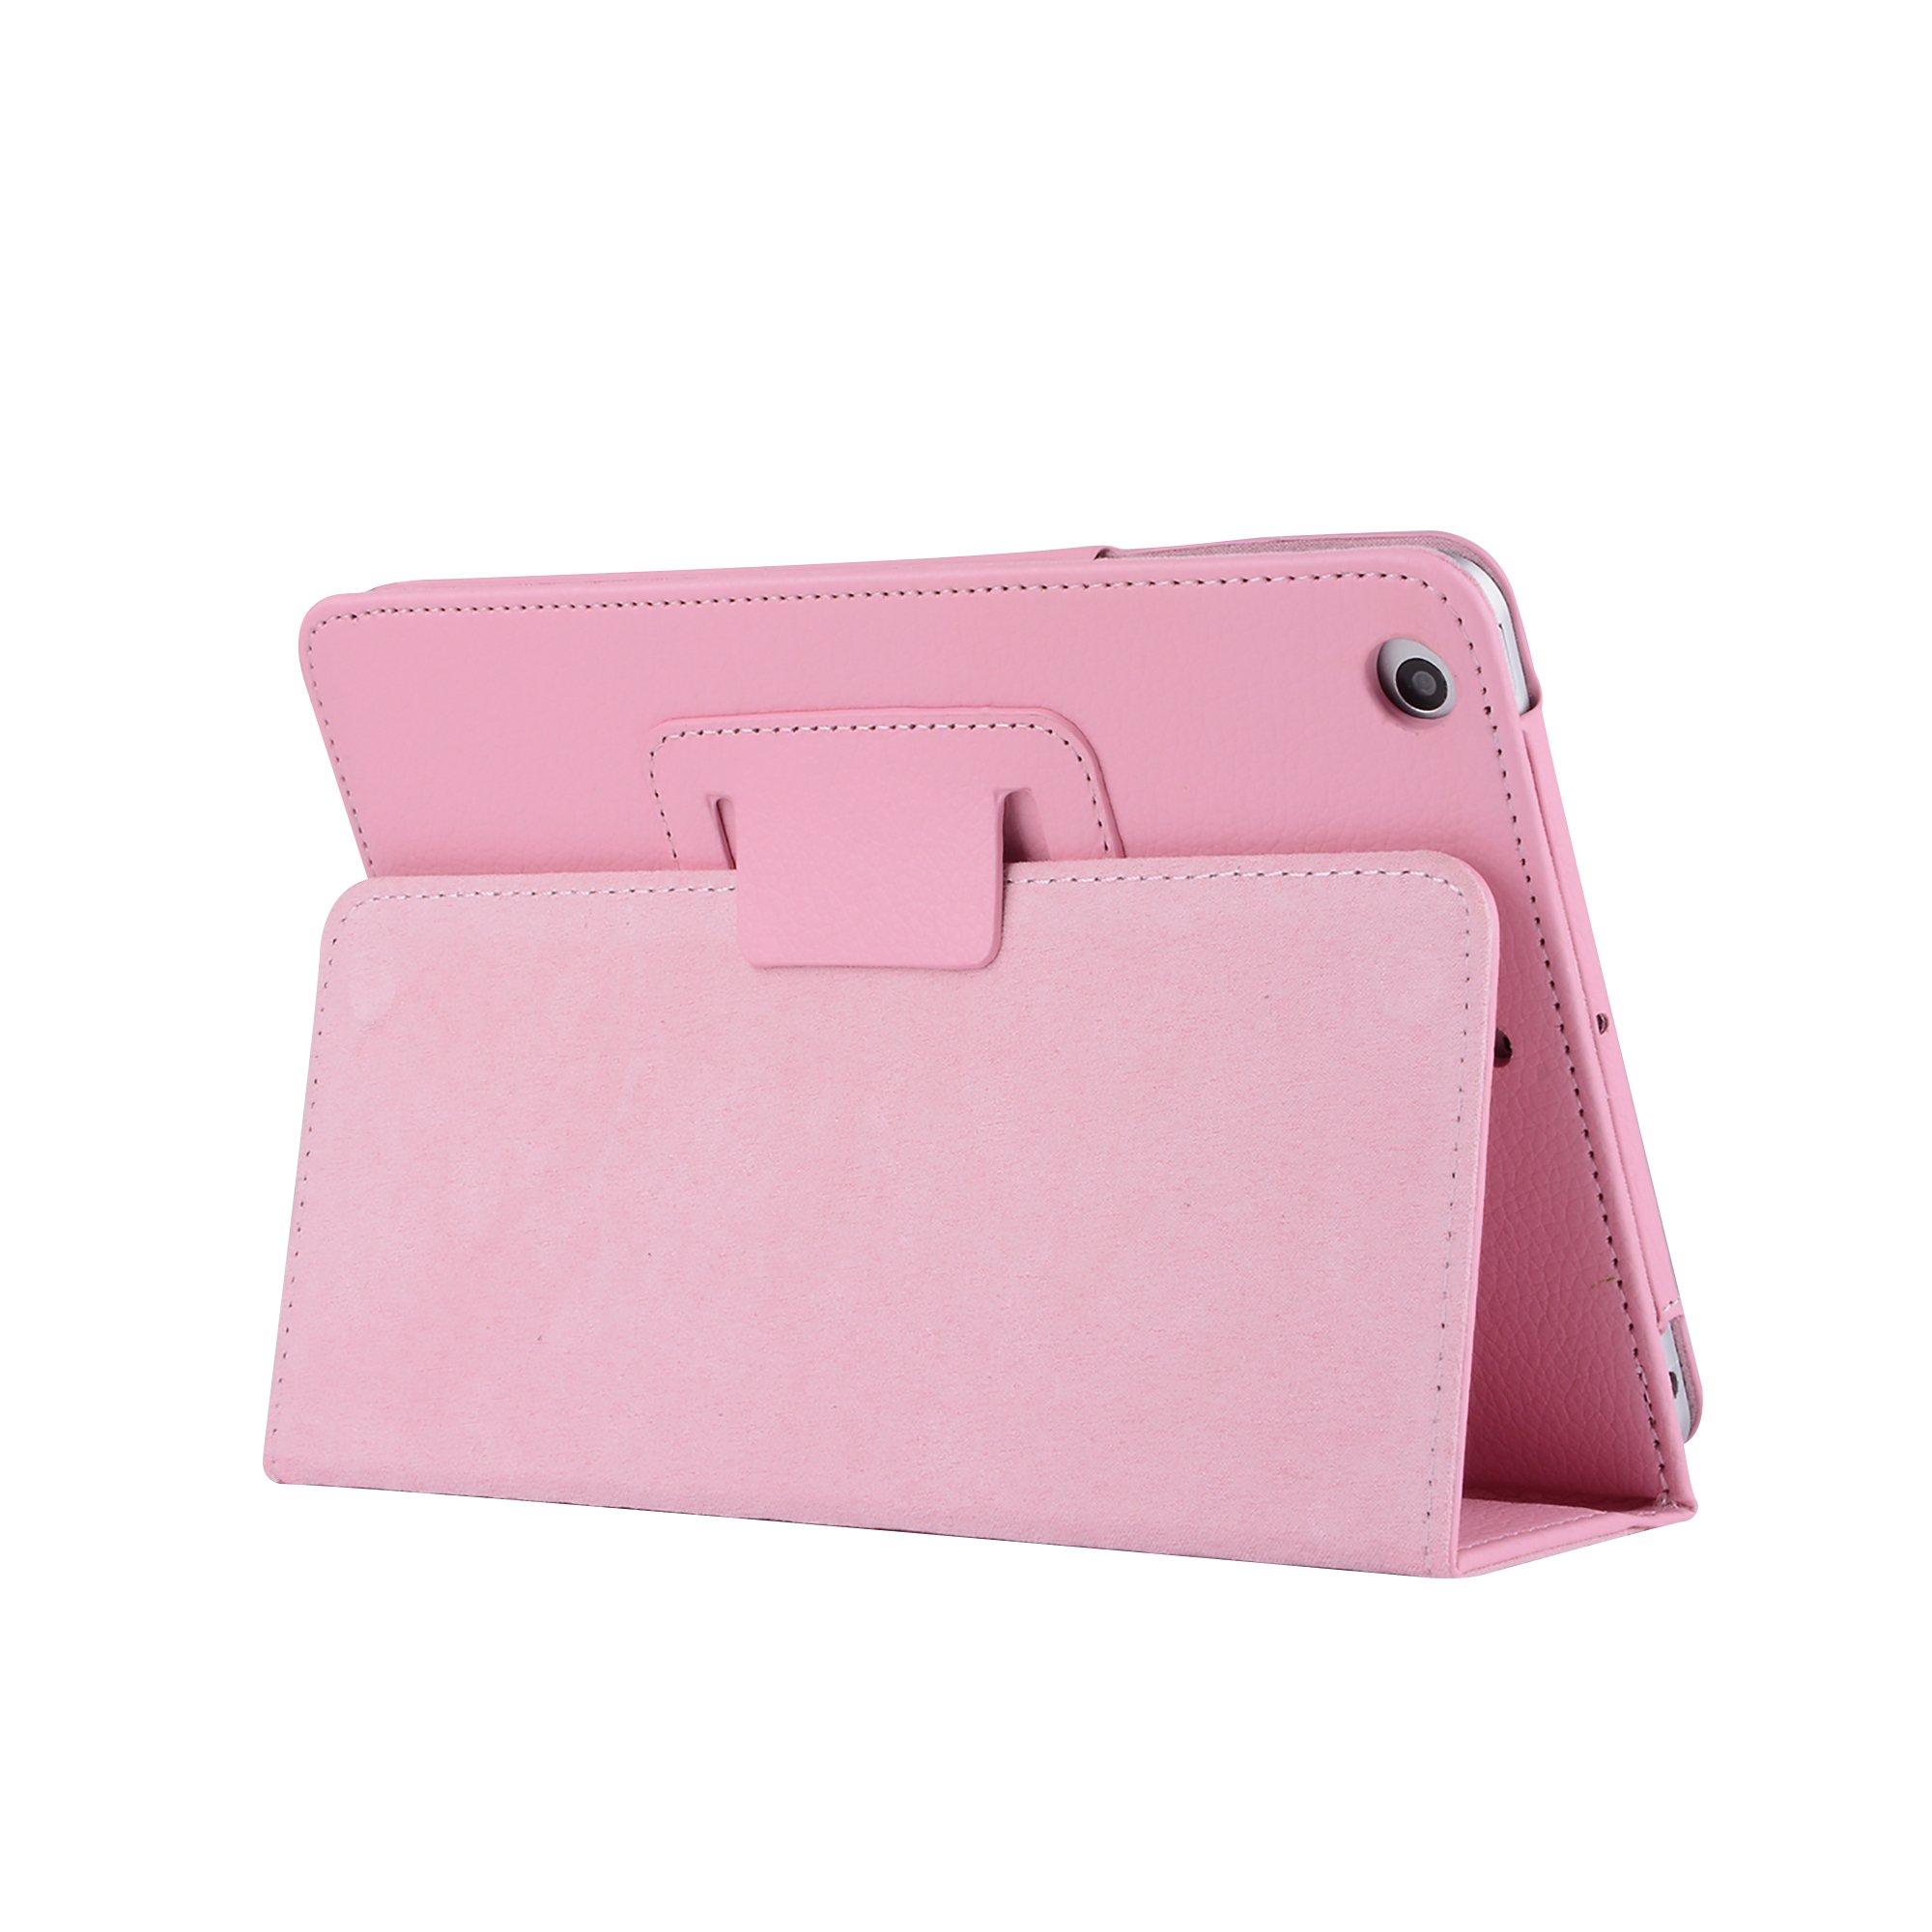 iPad Mini Case Cover, Mini/Mini 2/Mini 3 Skin Cover Ultra Slim Lightweight Case Cover PU Leather Shockproof Waterproof Tablet Case With Stand Function for iPad Apple Mini, Mini 2, Mini 3 - Pink